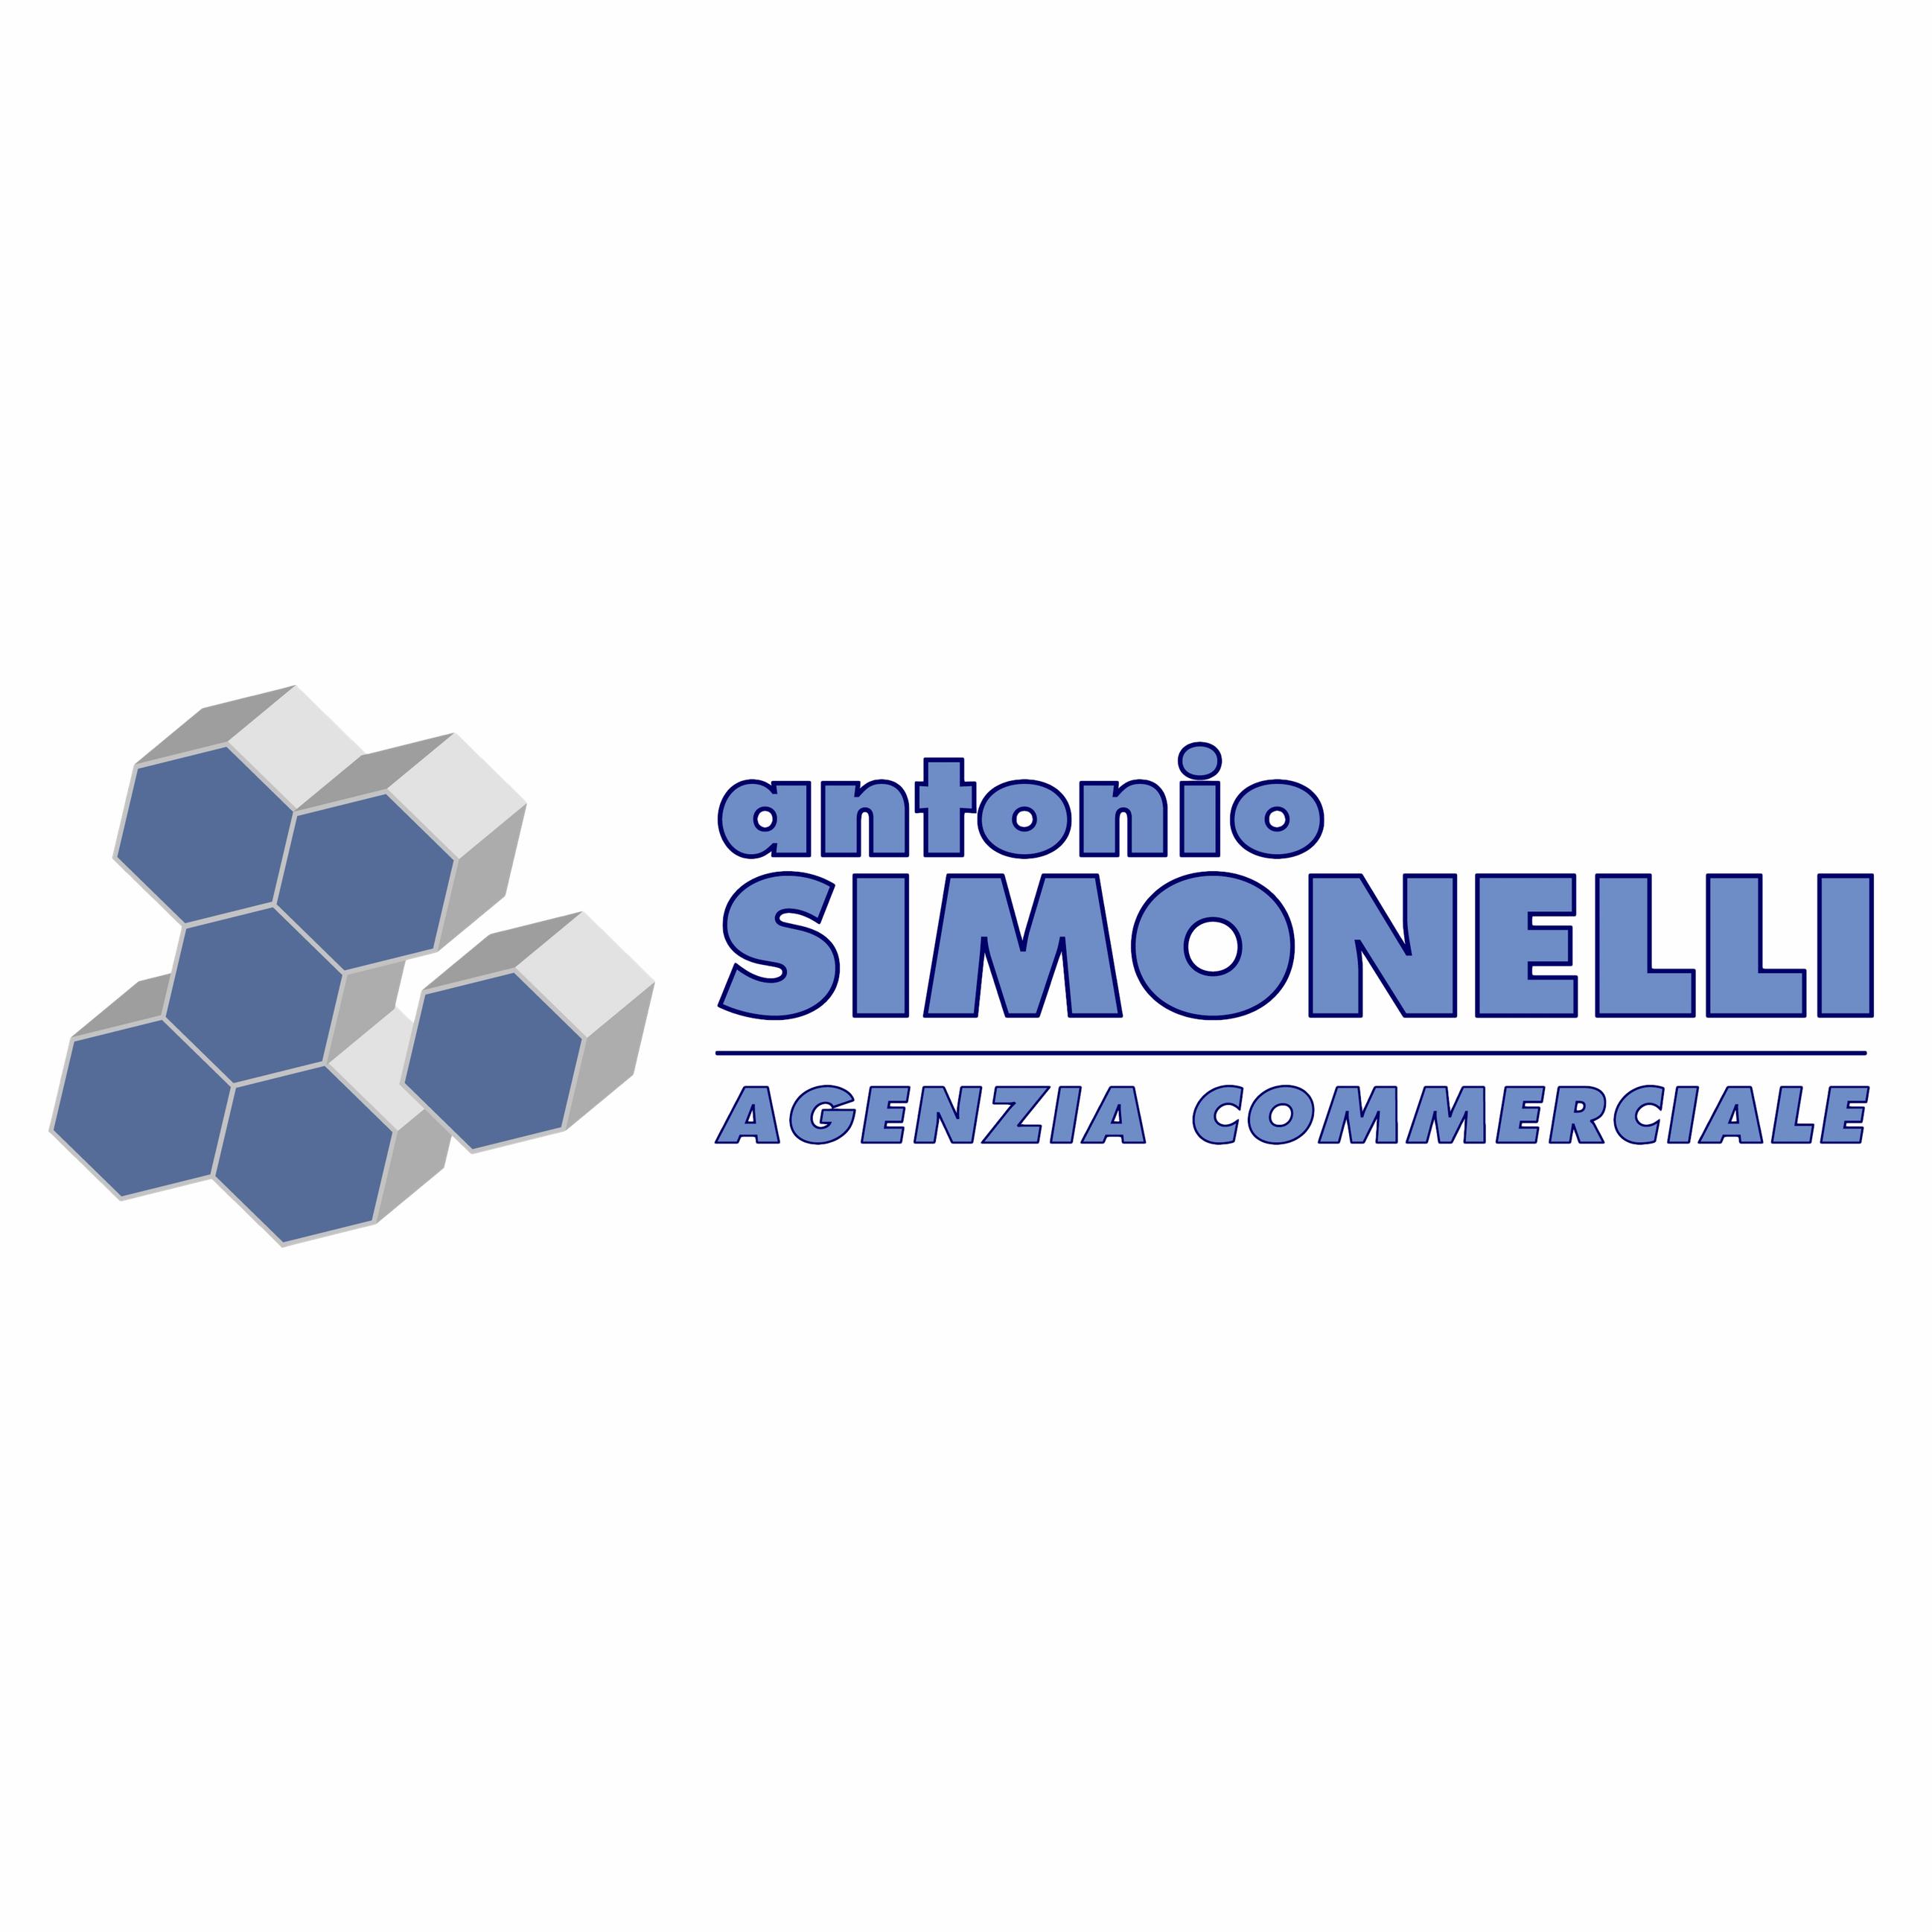 Logo Agenzia Commerciale - Antonio Simonelli - Cliente Citynet Srl